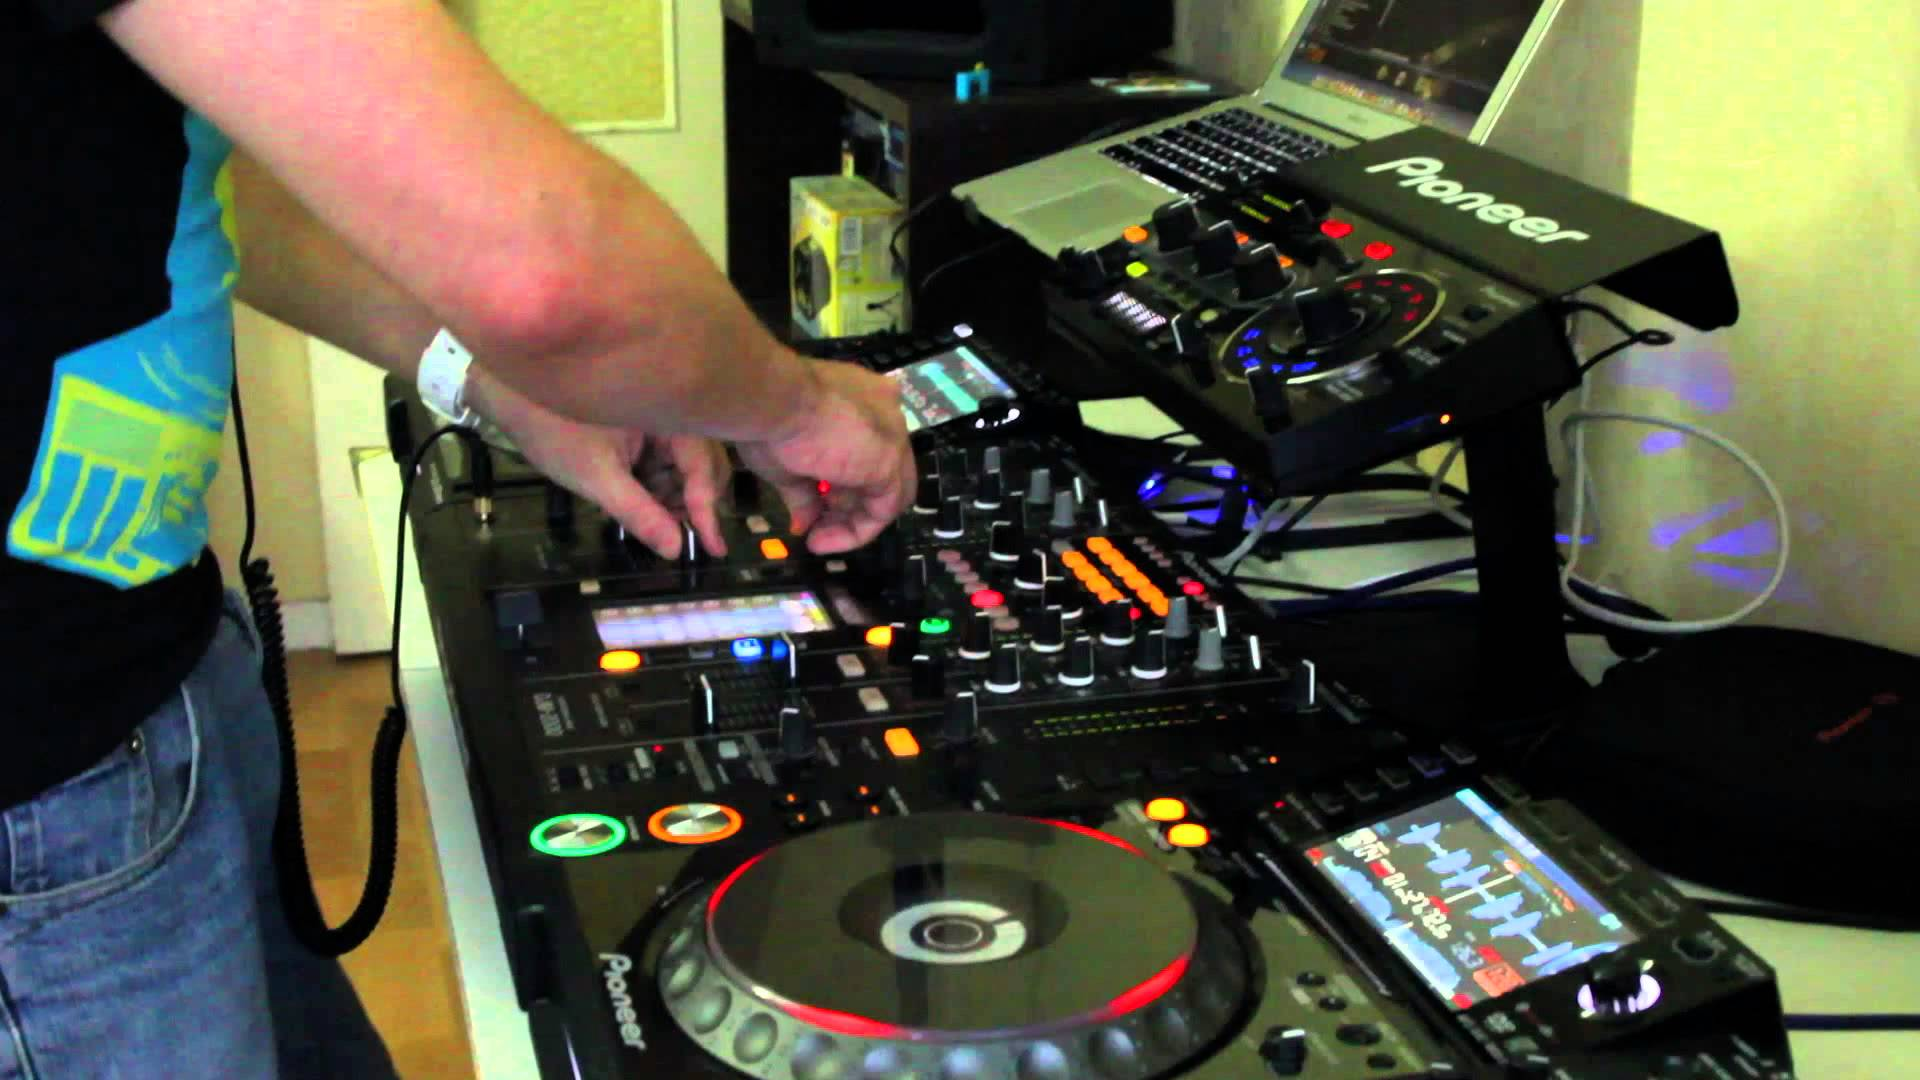 Donation de mon pack de pioneer cdj2000 et djm 2000 la - Table de mixage pioneer djm 2000 ...